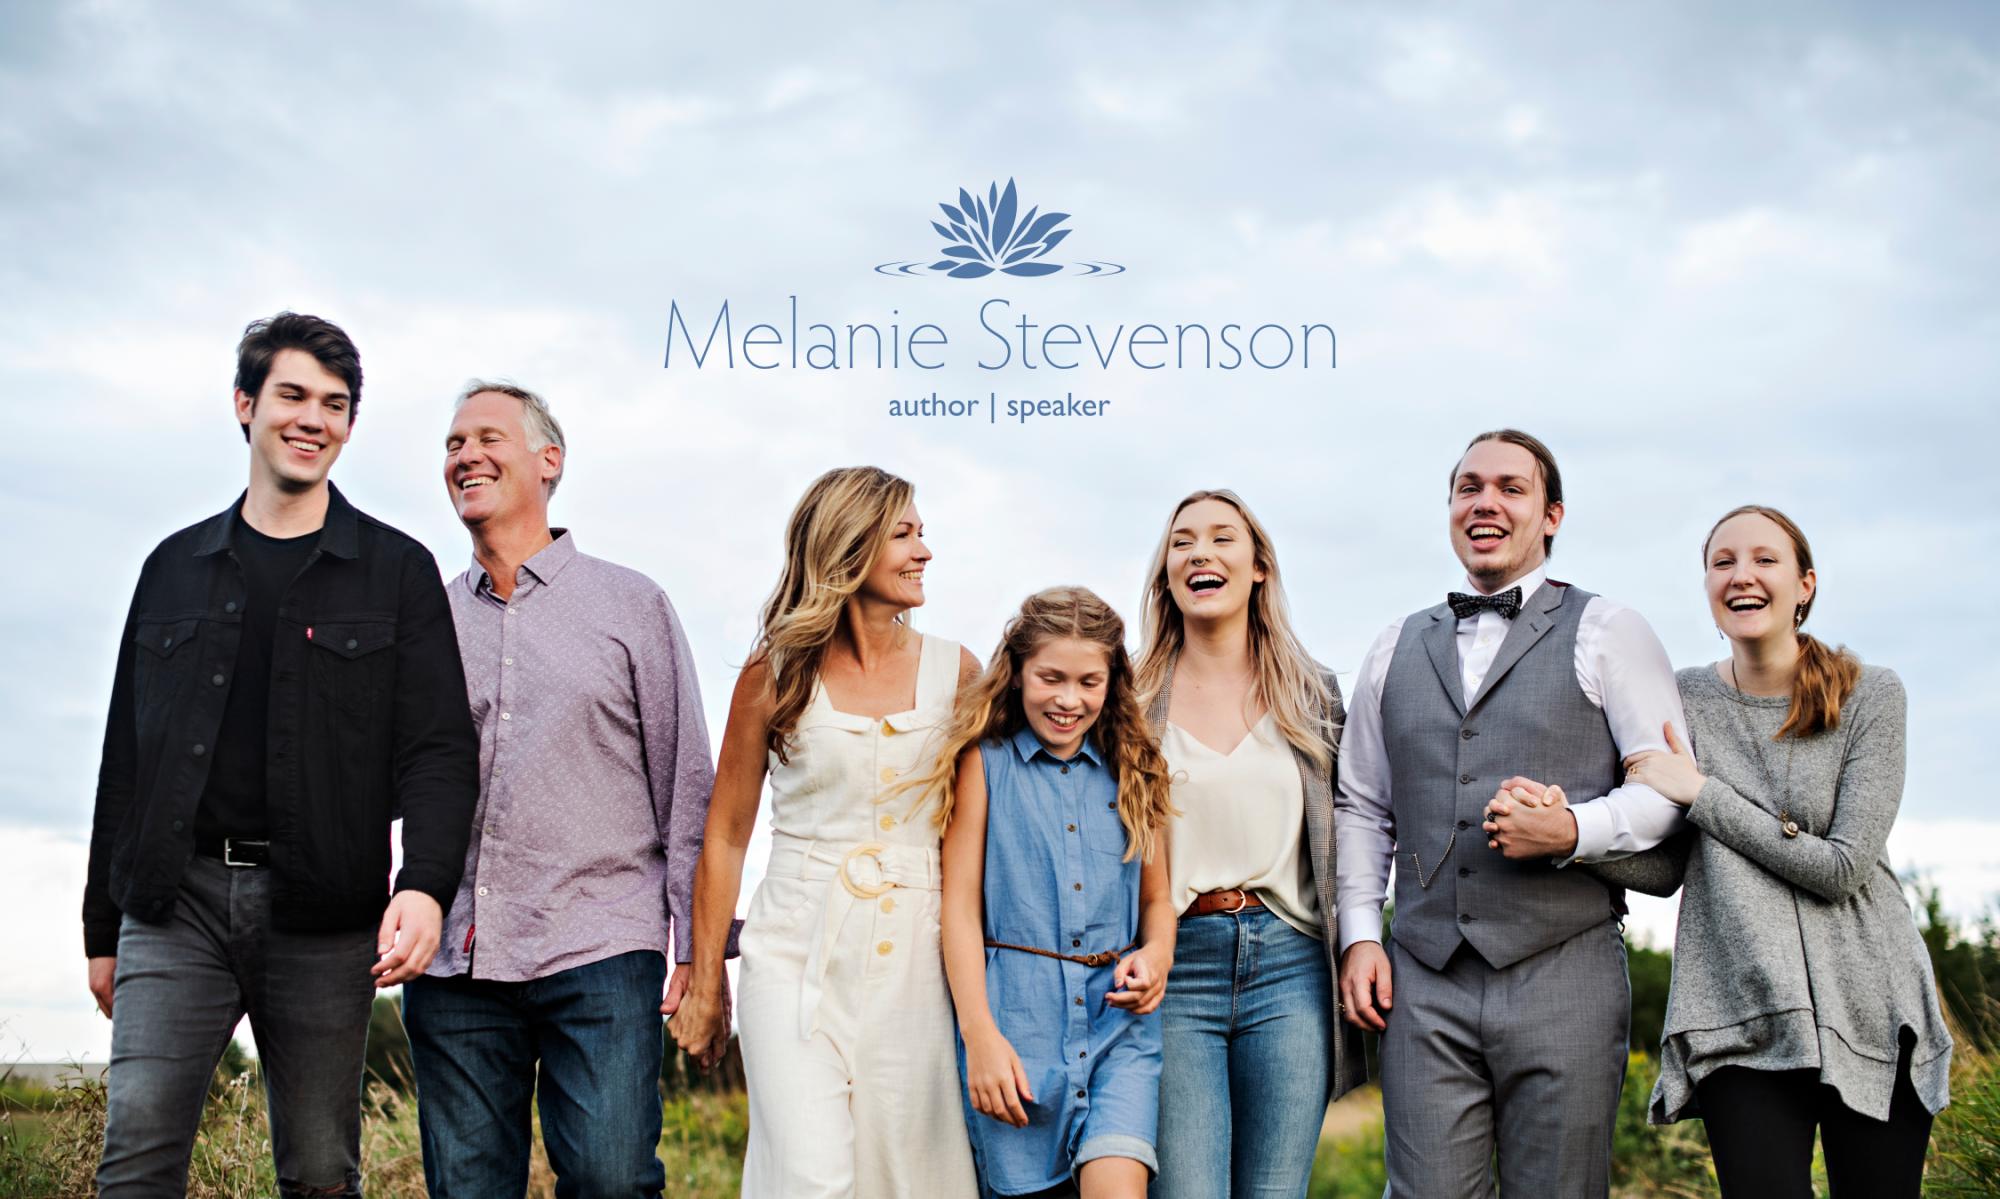 Melanie Stevenson